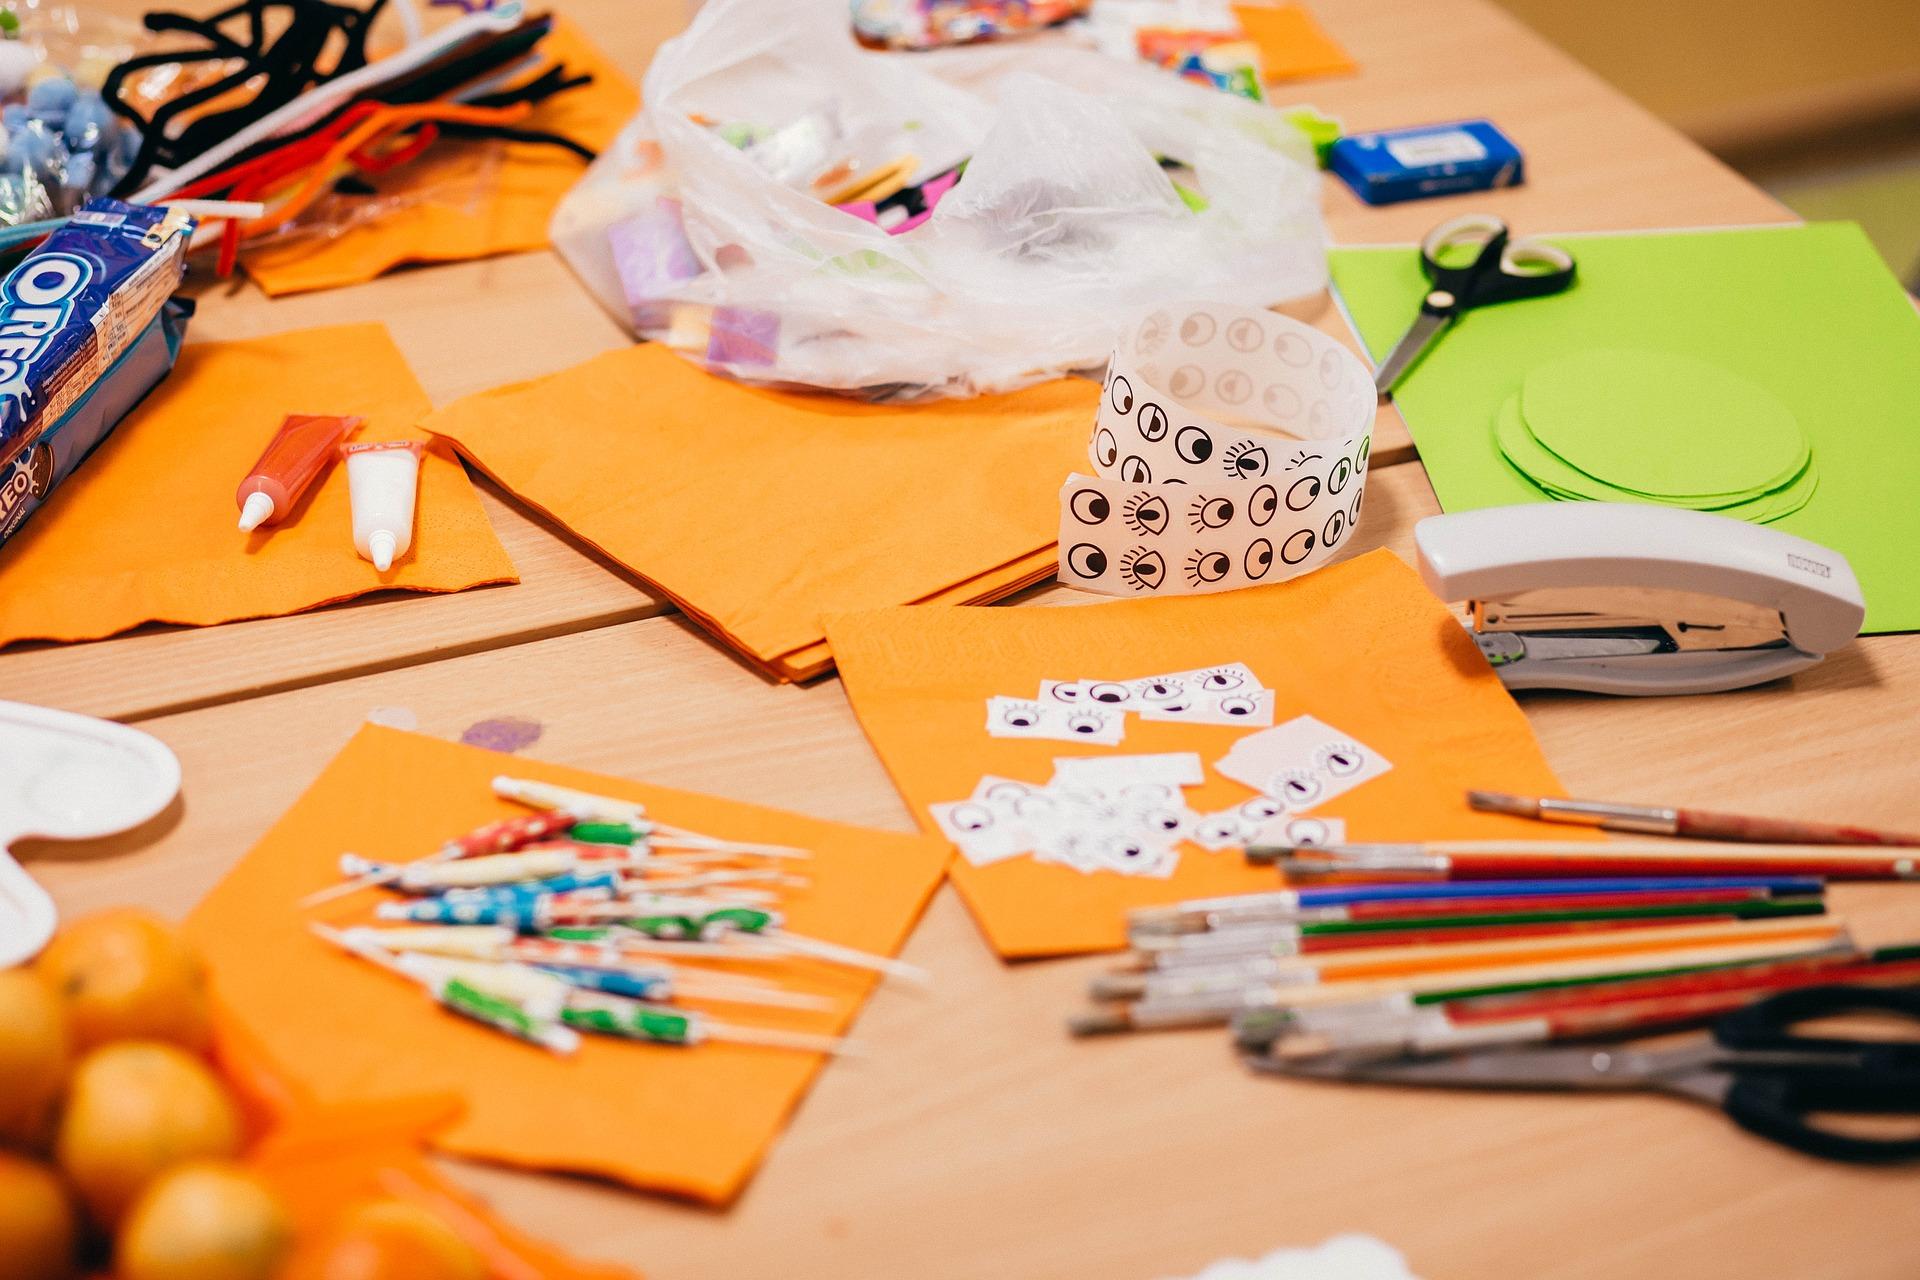 Loisirs - Table garnie de crayons, stickers